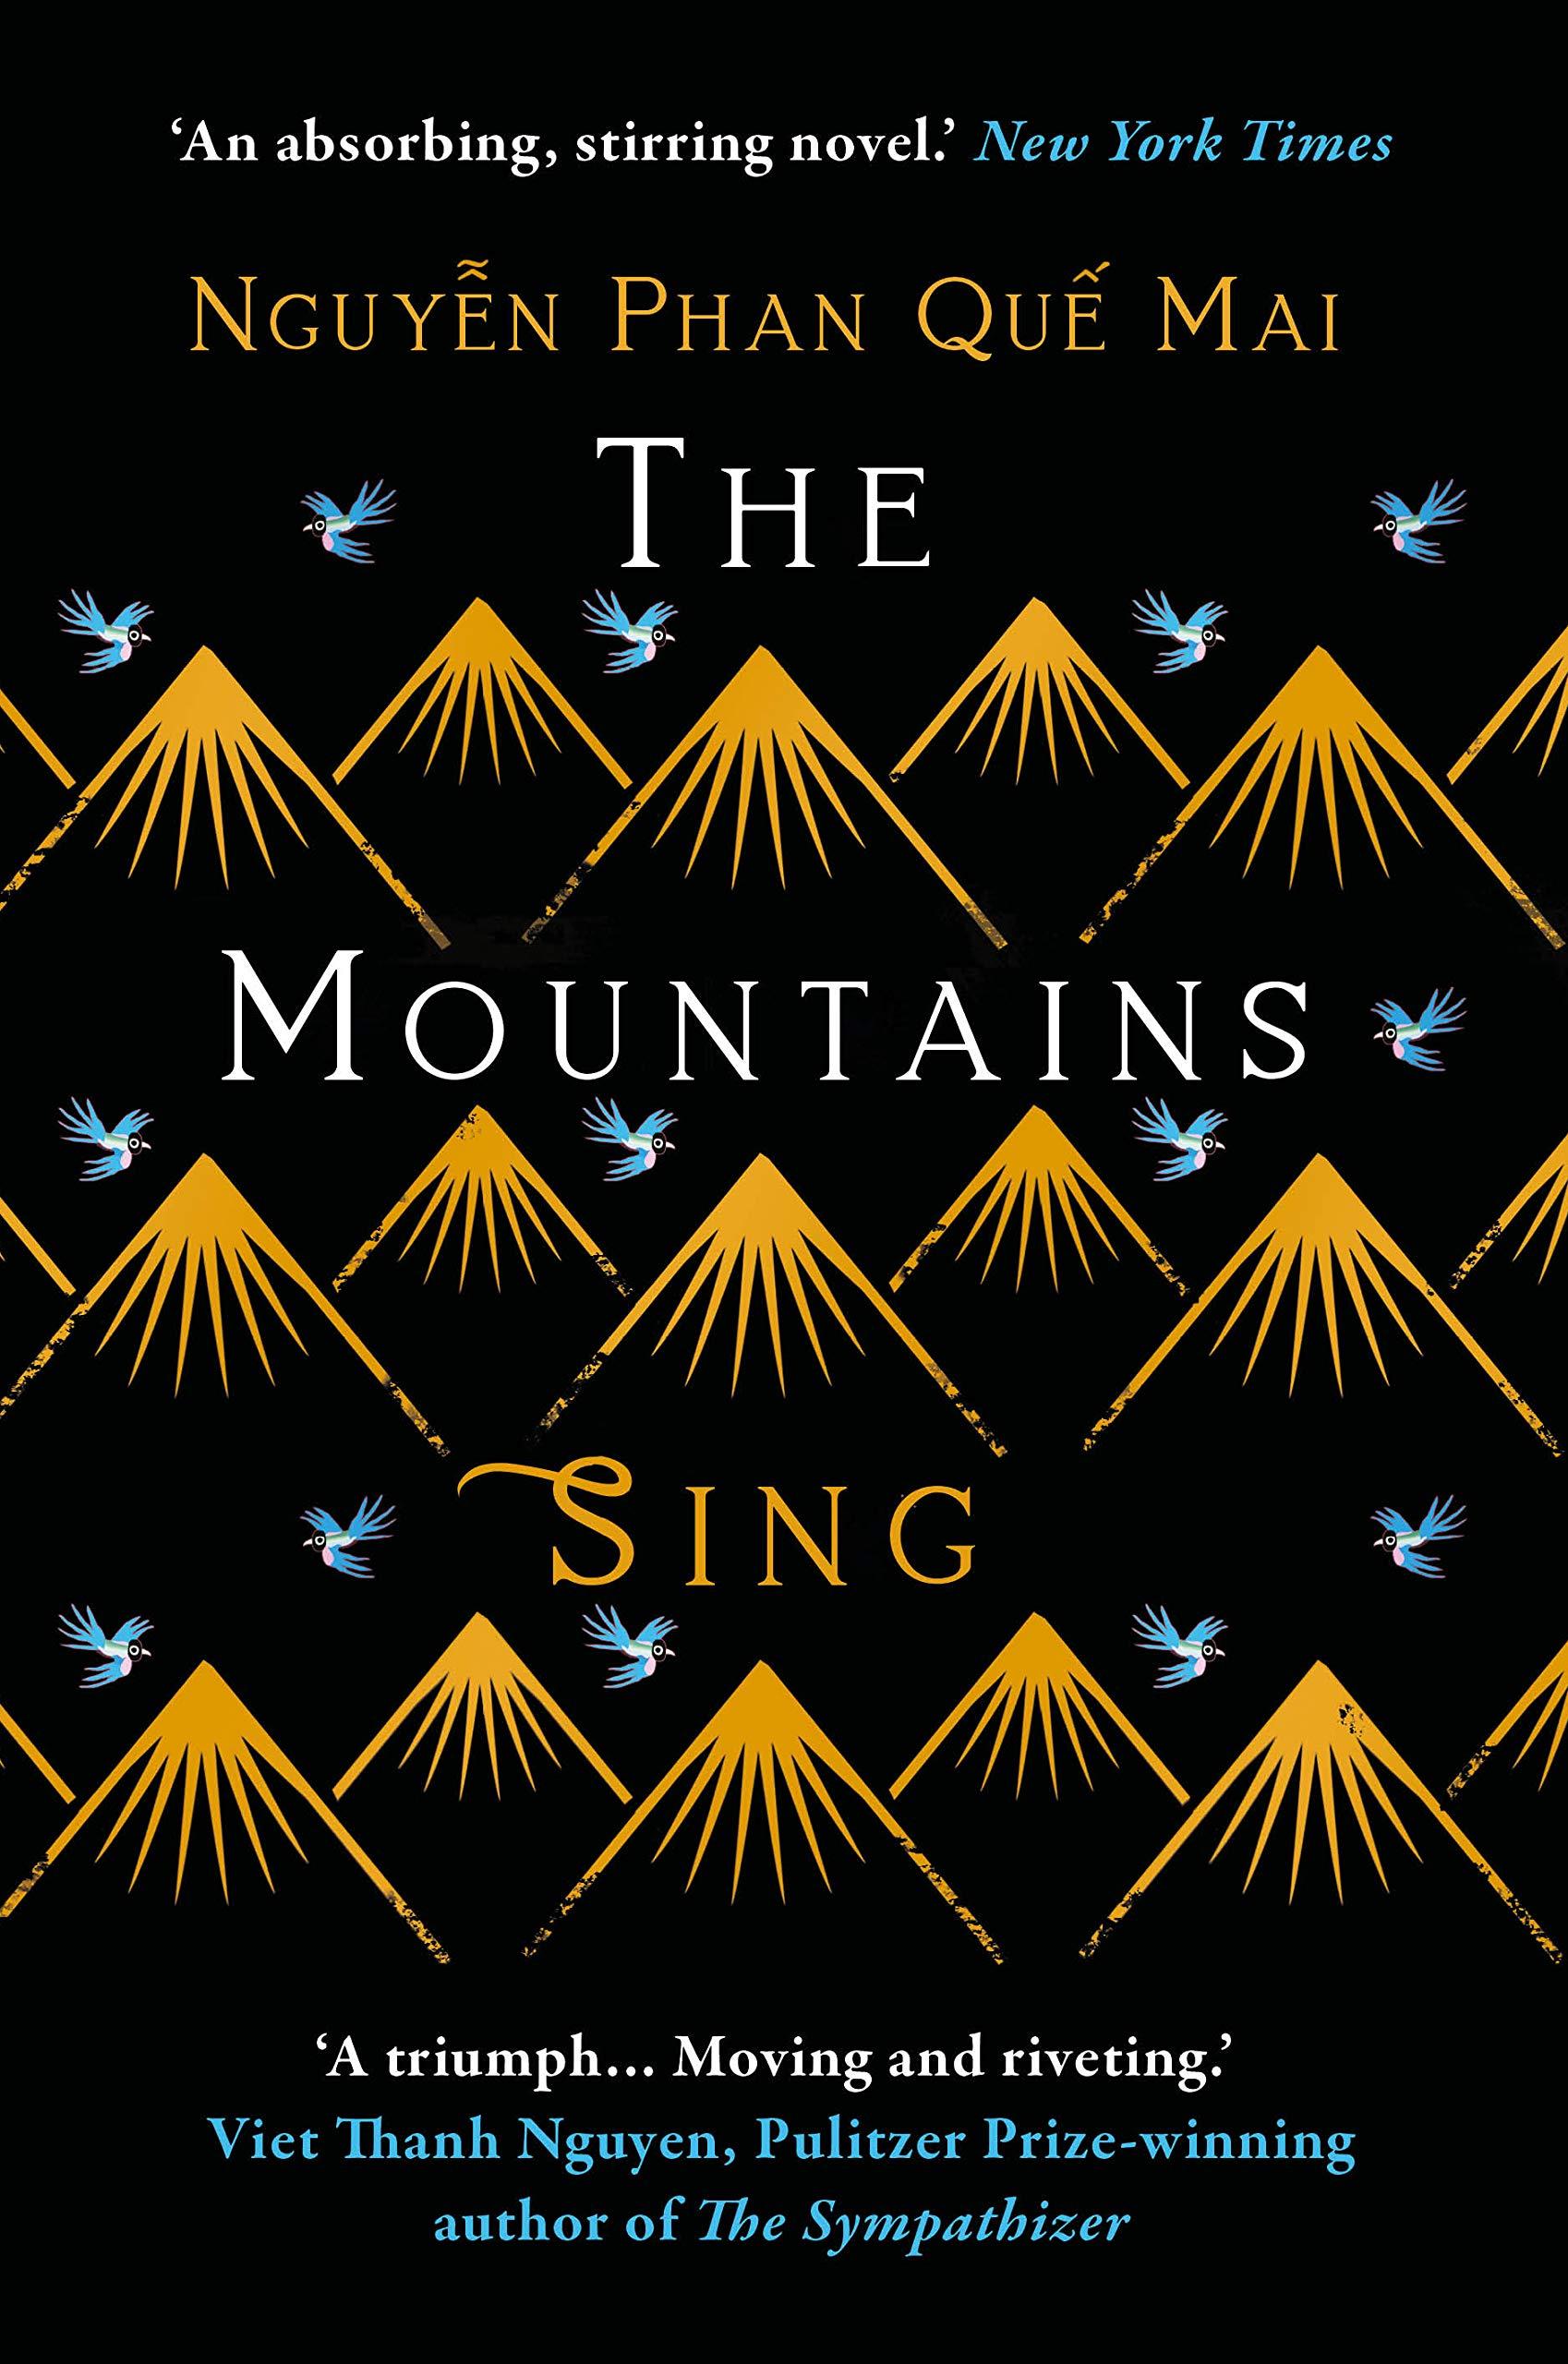 The Mountains Sing: Amazon.co.uk: Quế Mai, Nguyễn Phan: 9781786079220: Books